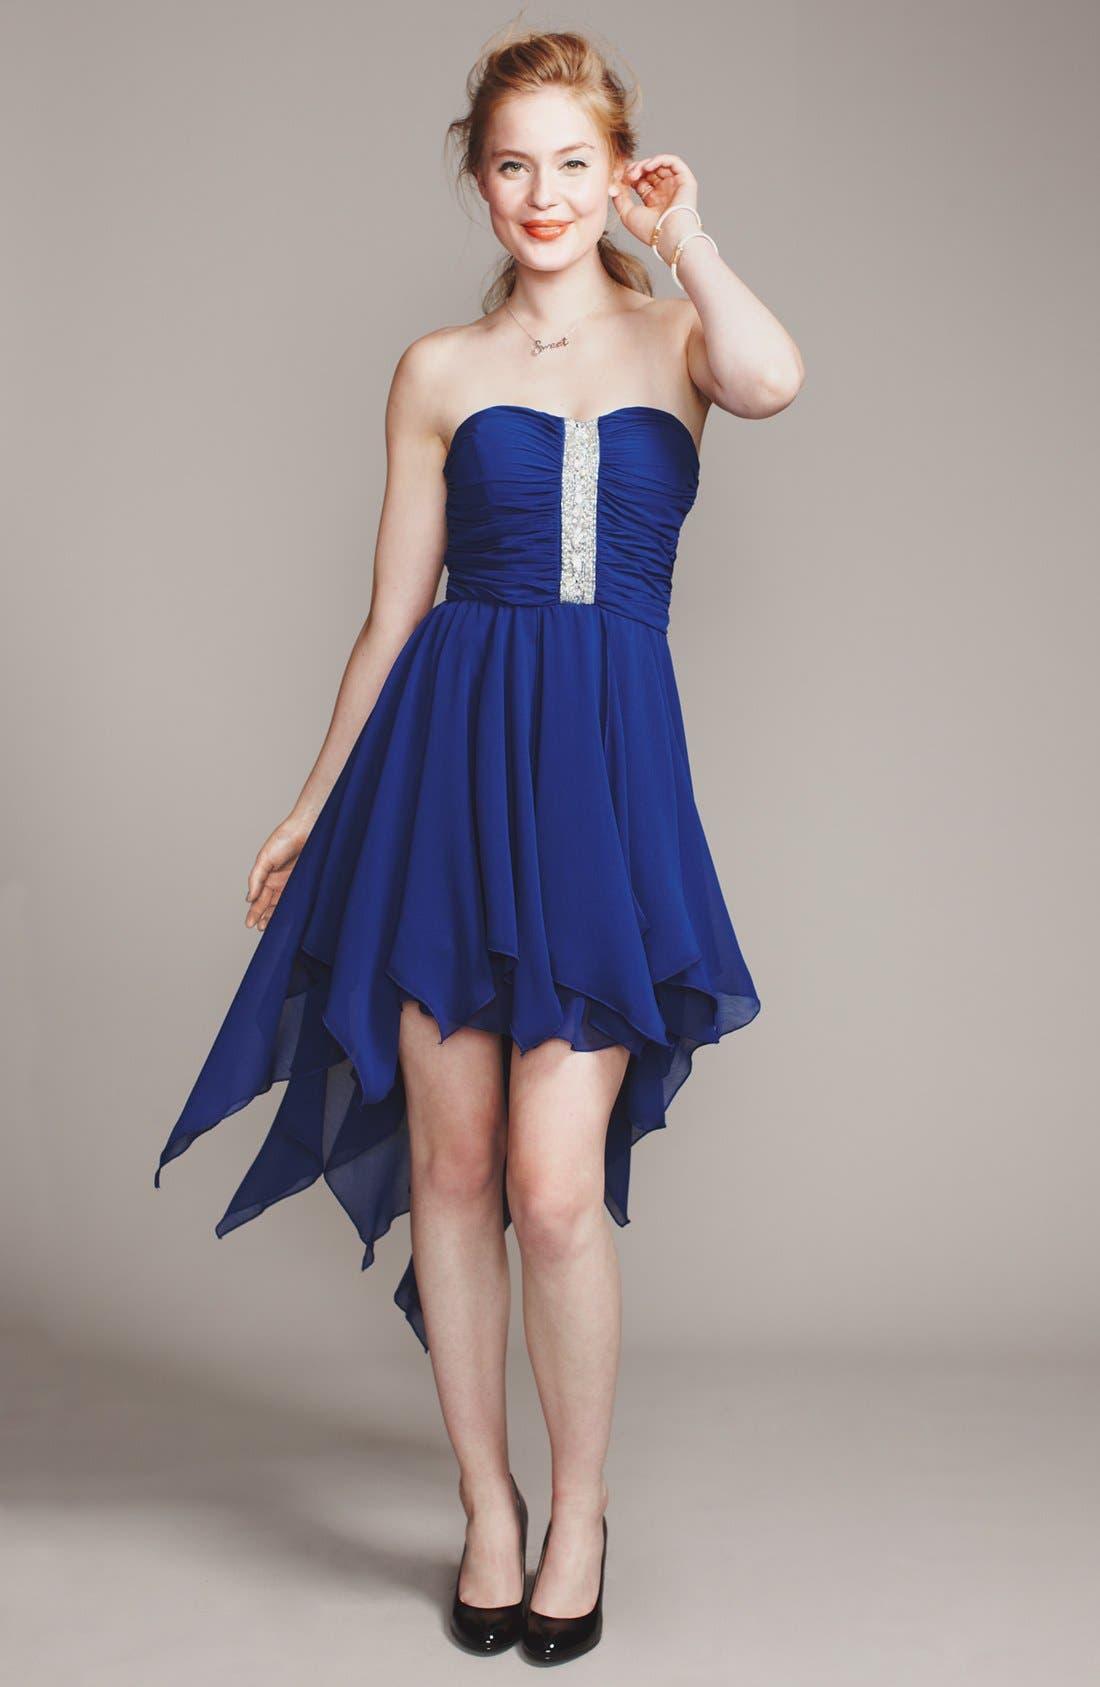 Main Image - As U Wish Dress & Accessories